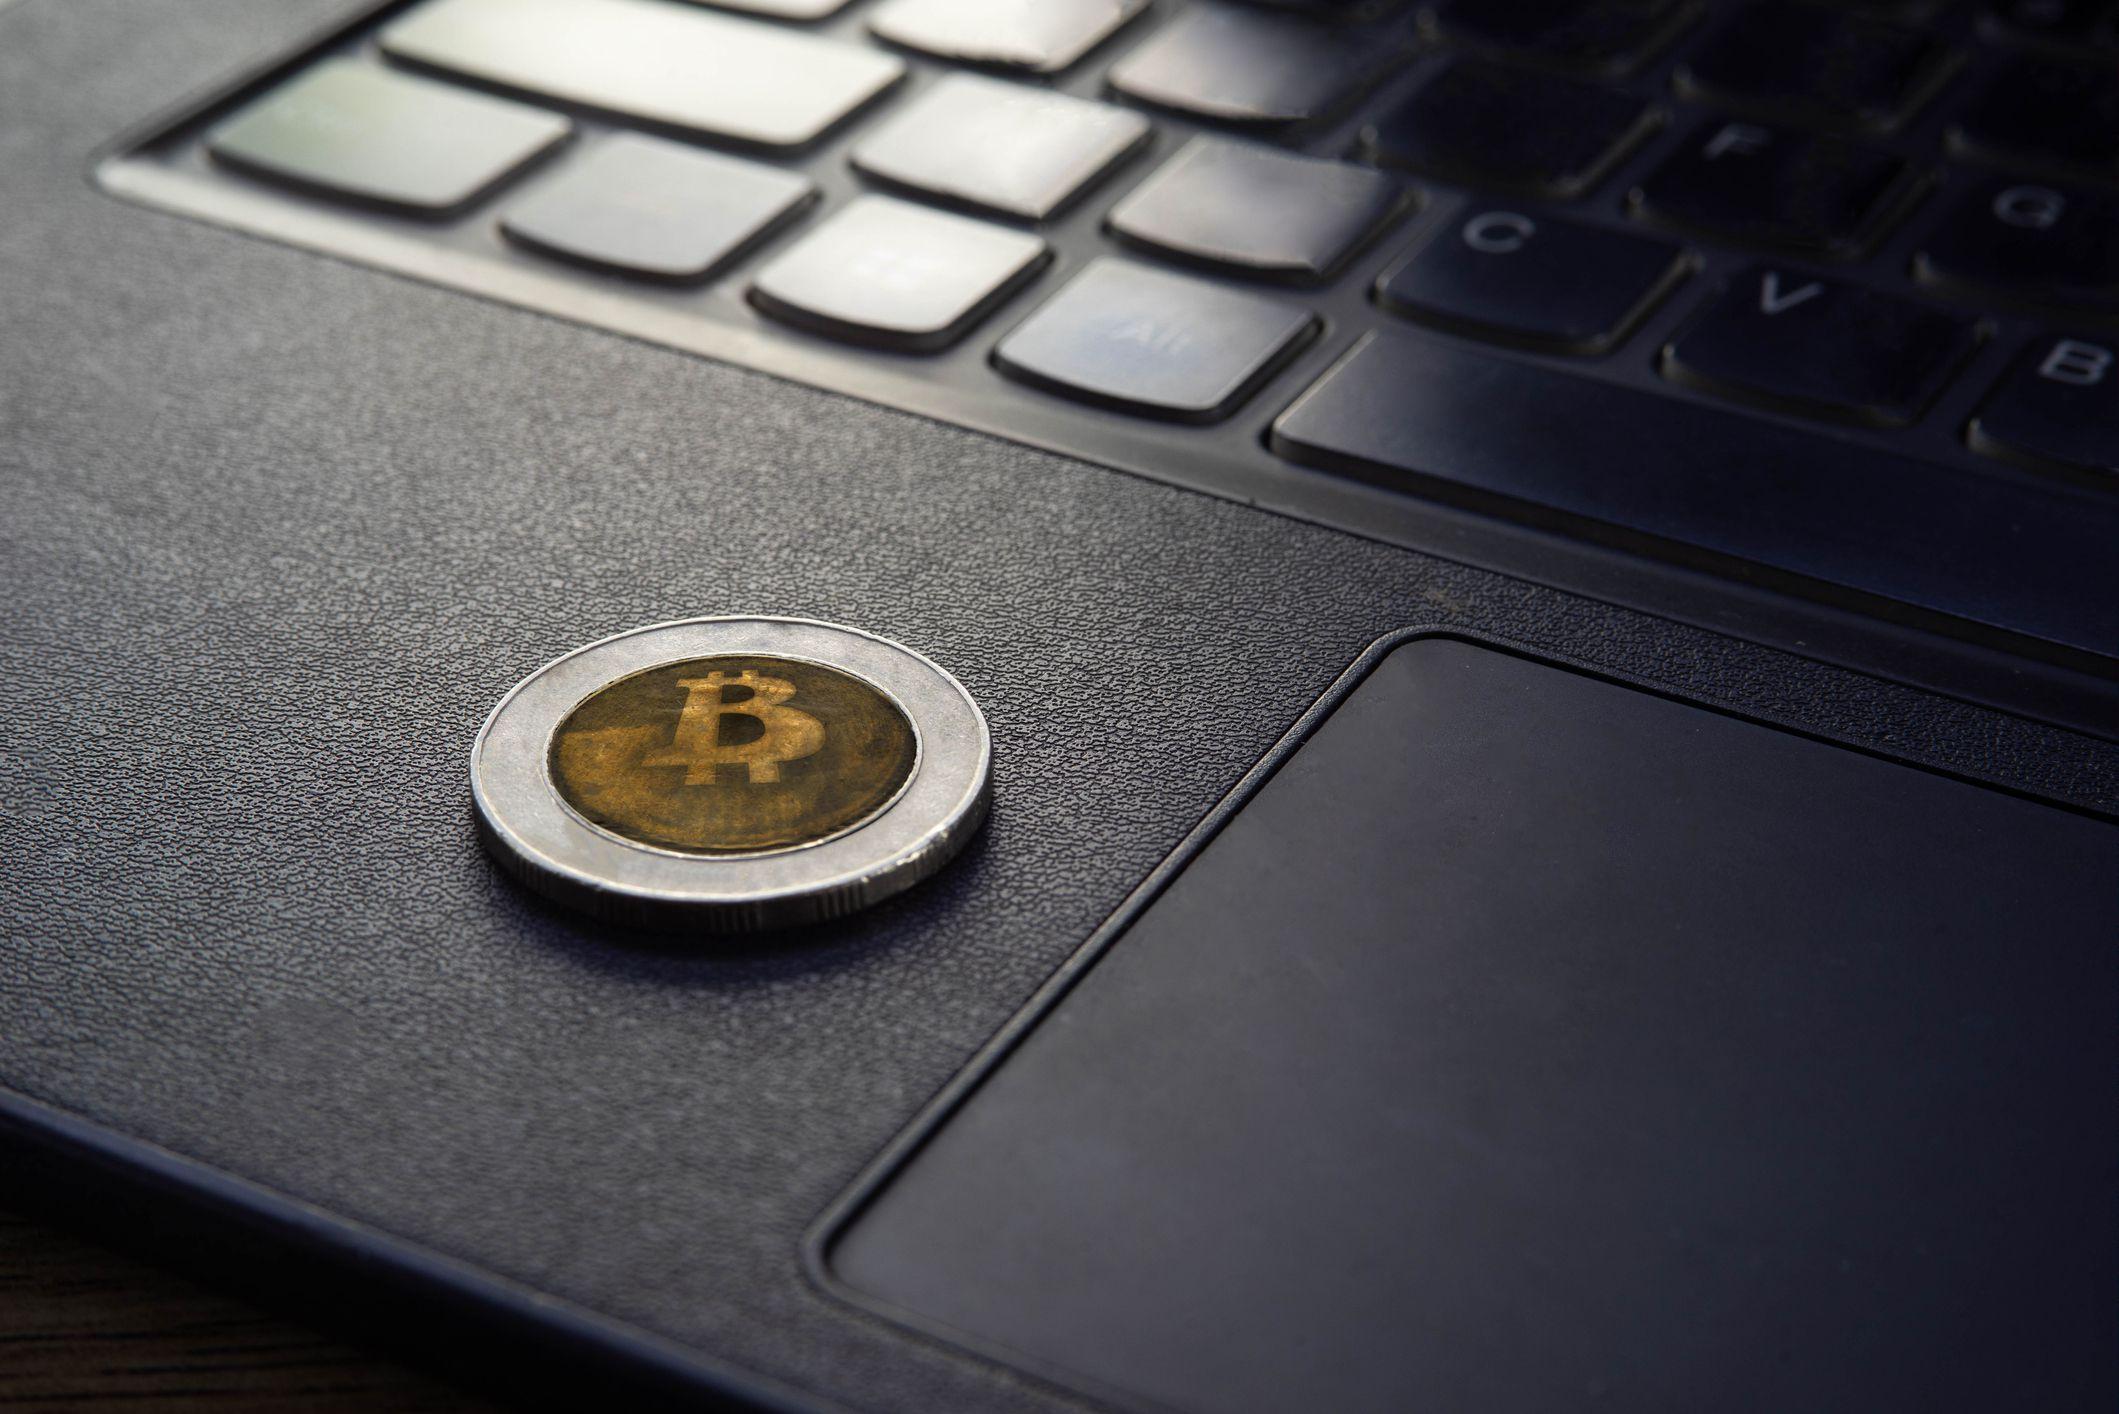 Altcoins coin academy and